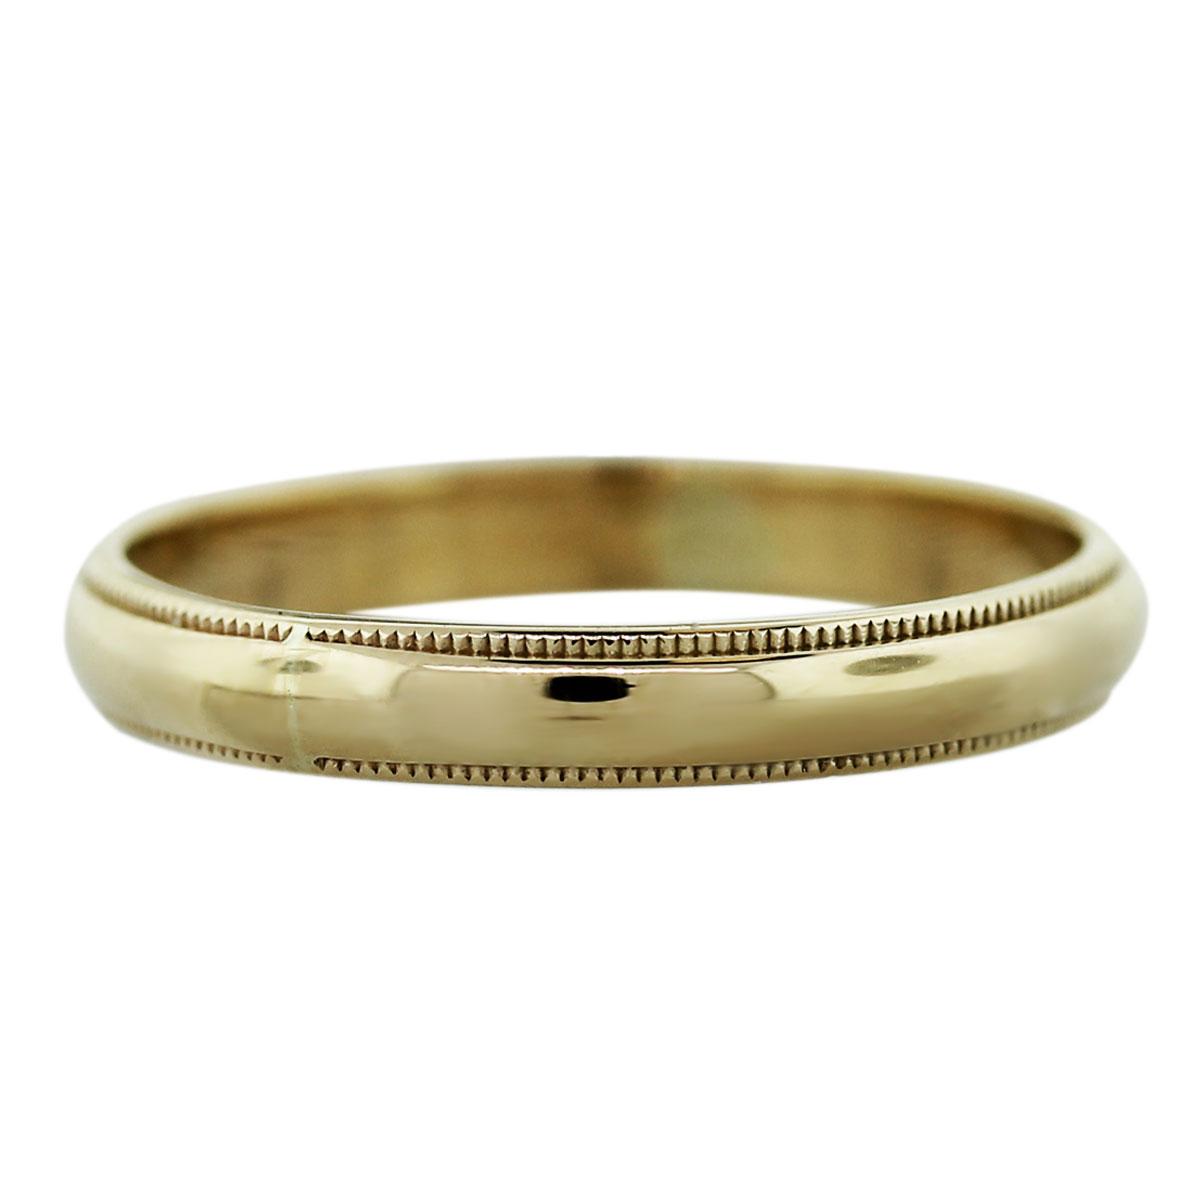 14k Yellow Gold 16dwt Mens Wedding Band Ring Boca Raton